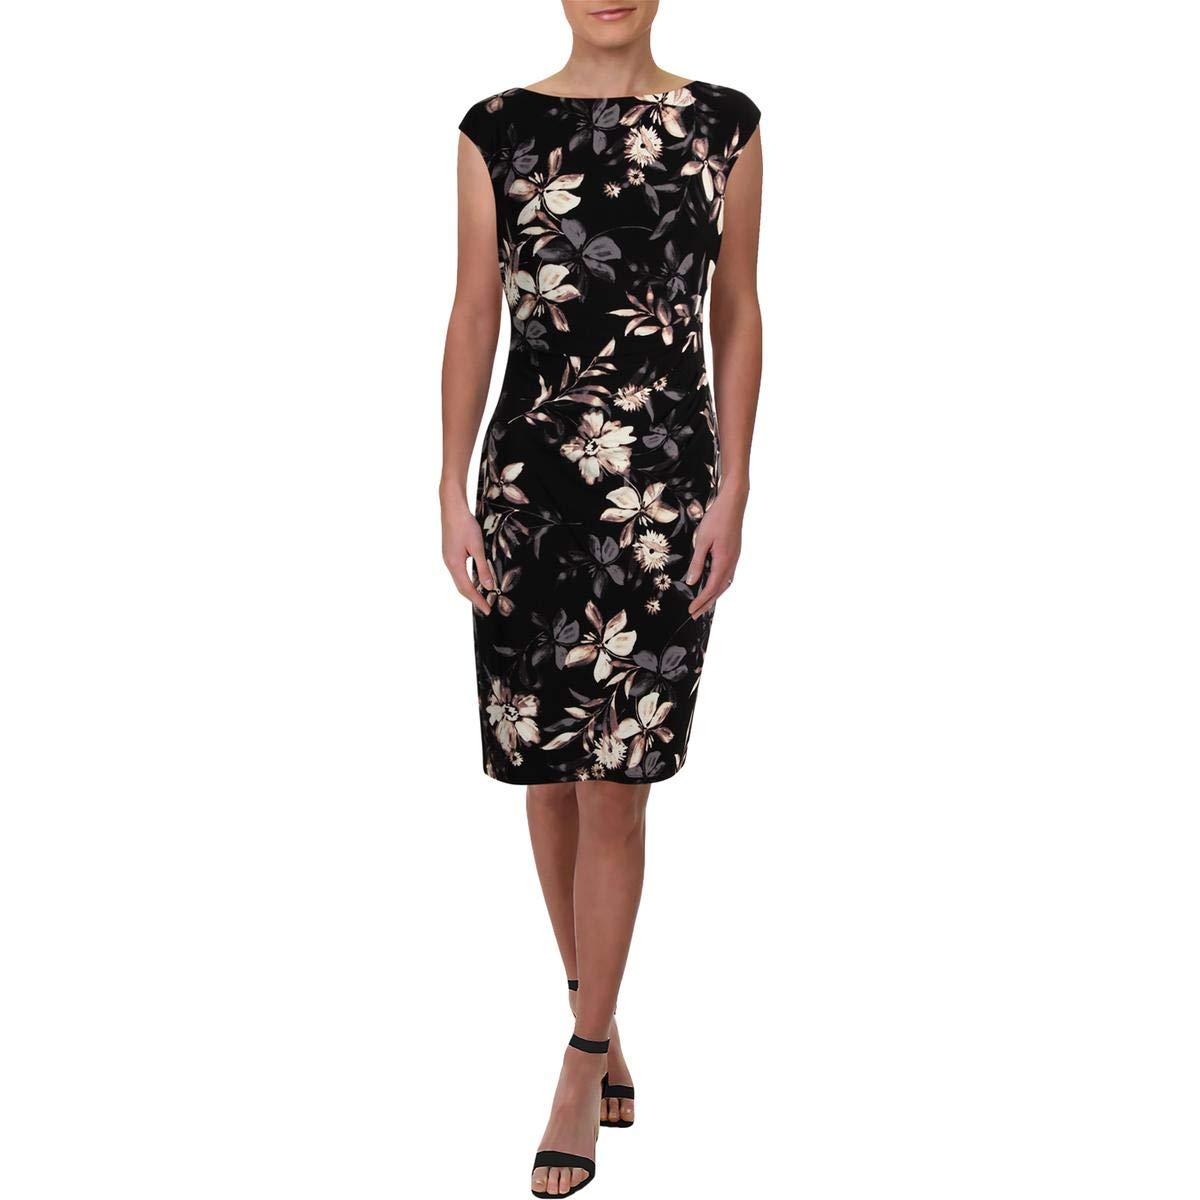 Black Peach Multi Lauren Ralph Lauren Womens Jersey Floral Print Cocktail Dress